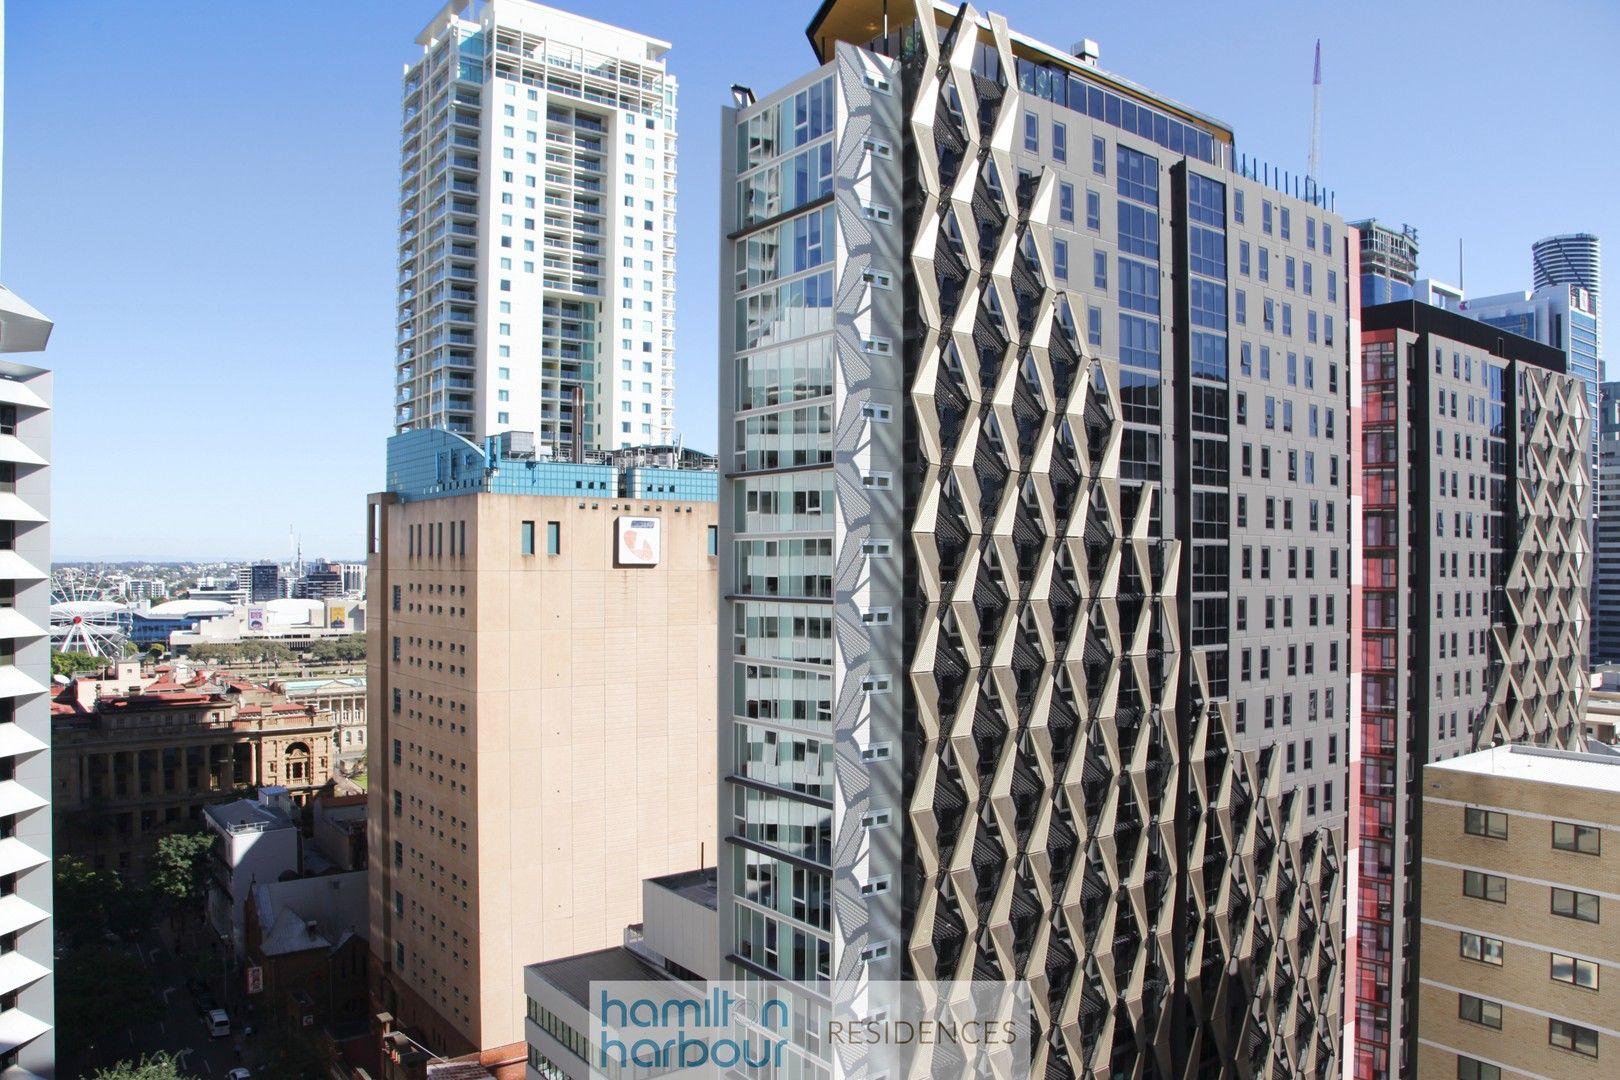 2 bedrooms Apartment / Unit / Flat in  BRISBANE CITY QLD, 4000